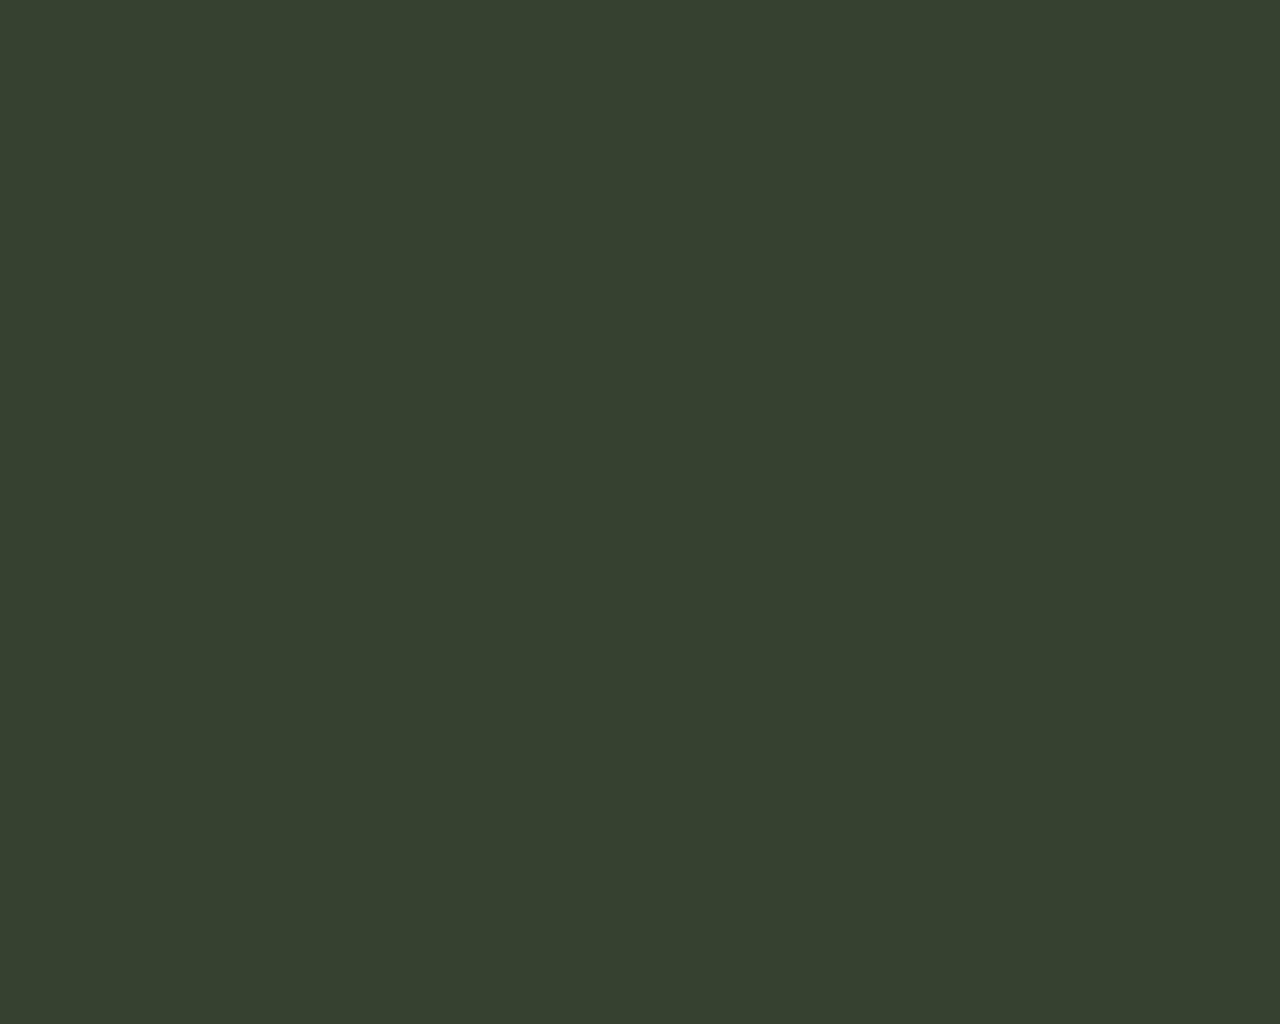 1280x1024 Kombu Green Solid Color Background